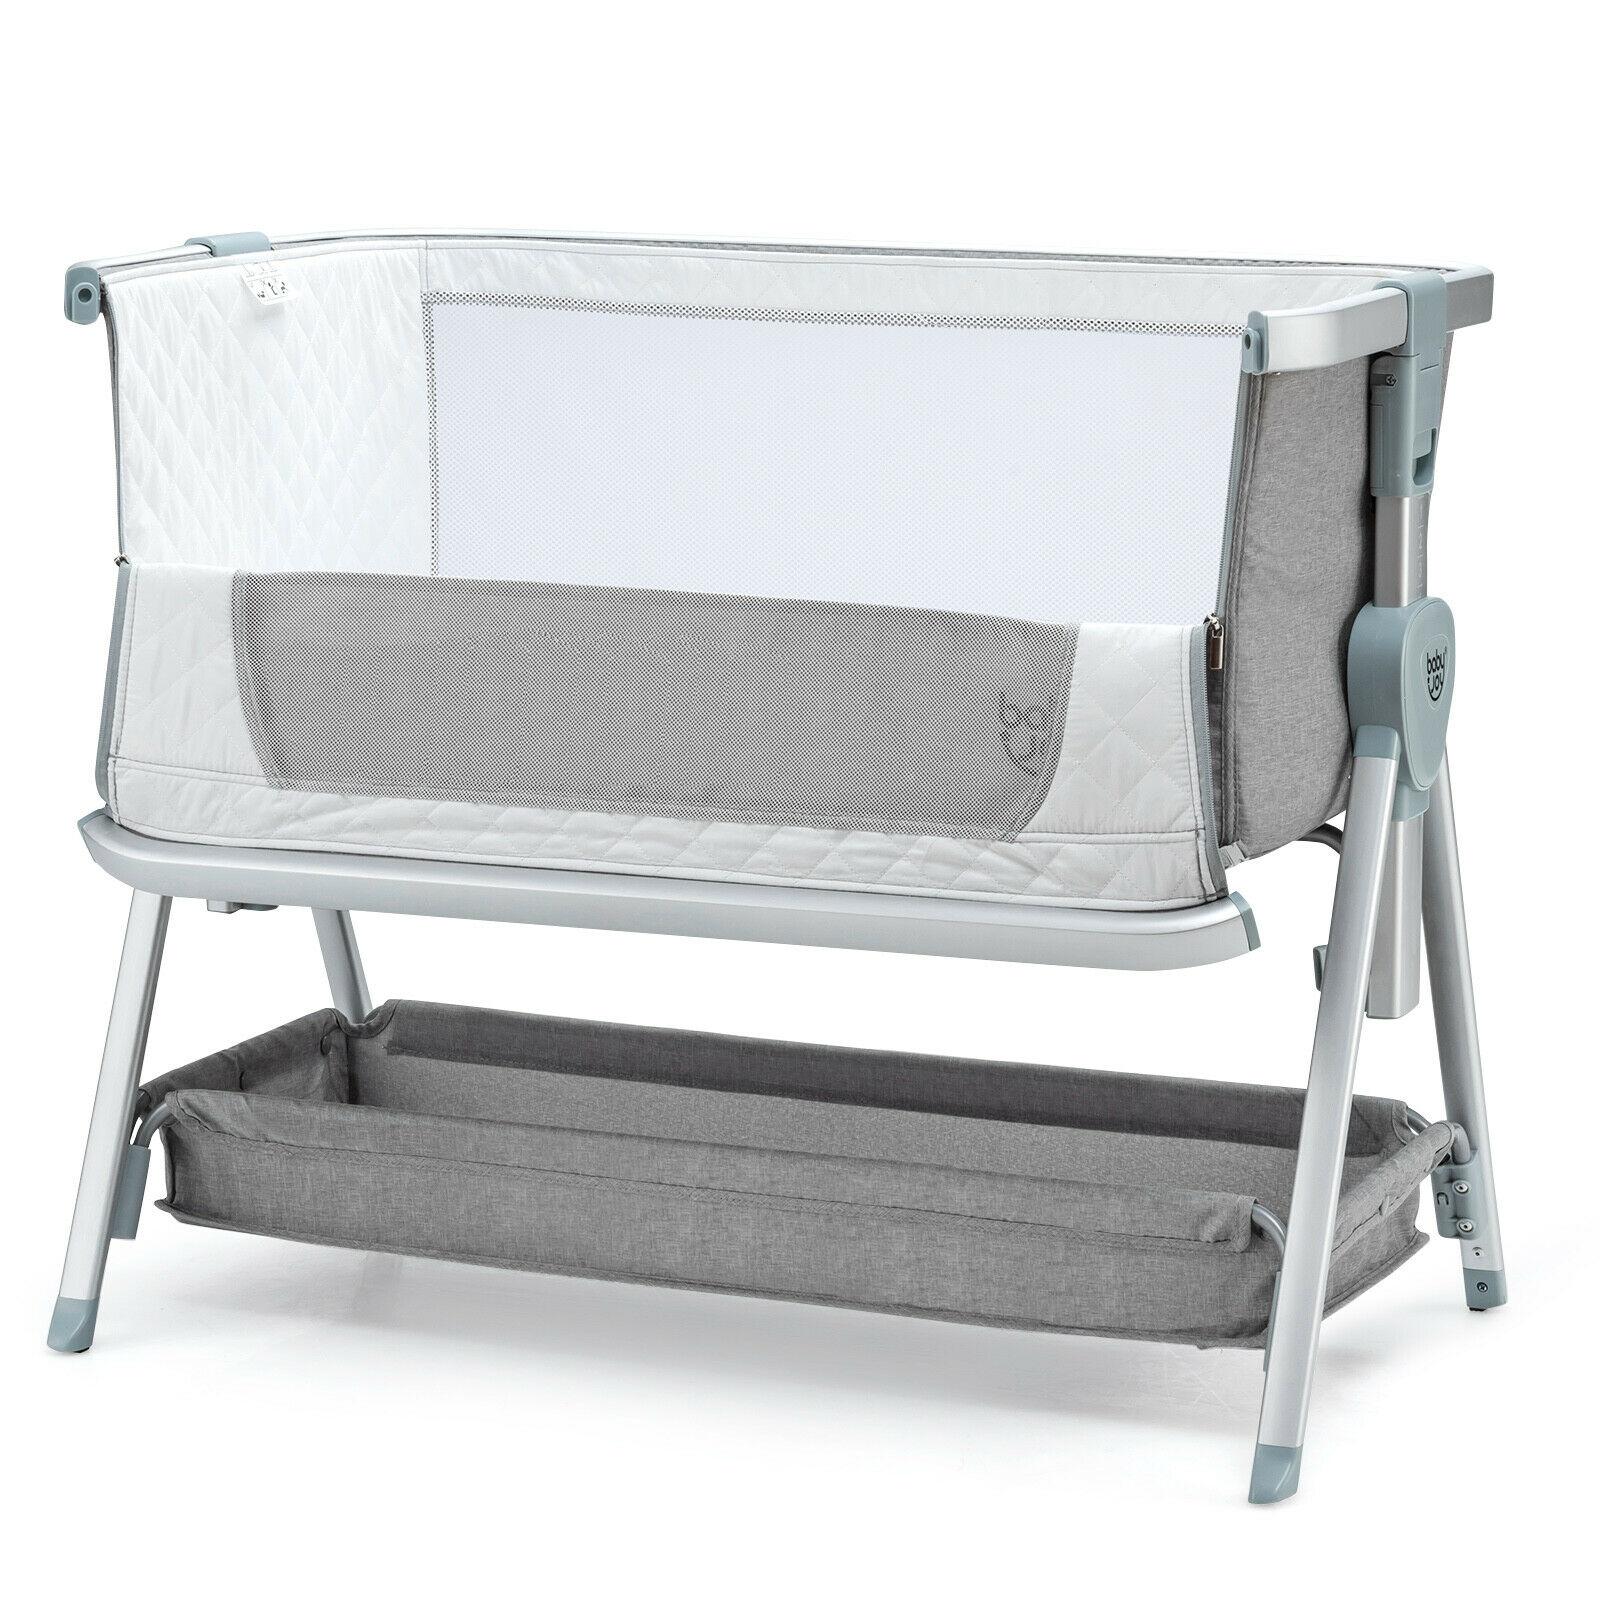 Baby Bed Side Crib Portable Adjustable Infant Travel Sleeper Bassinet Light